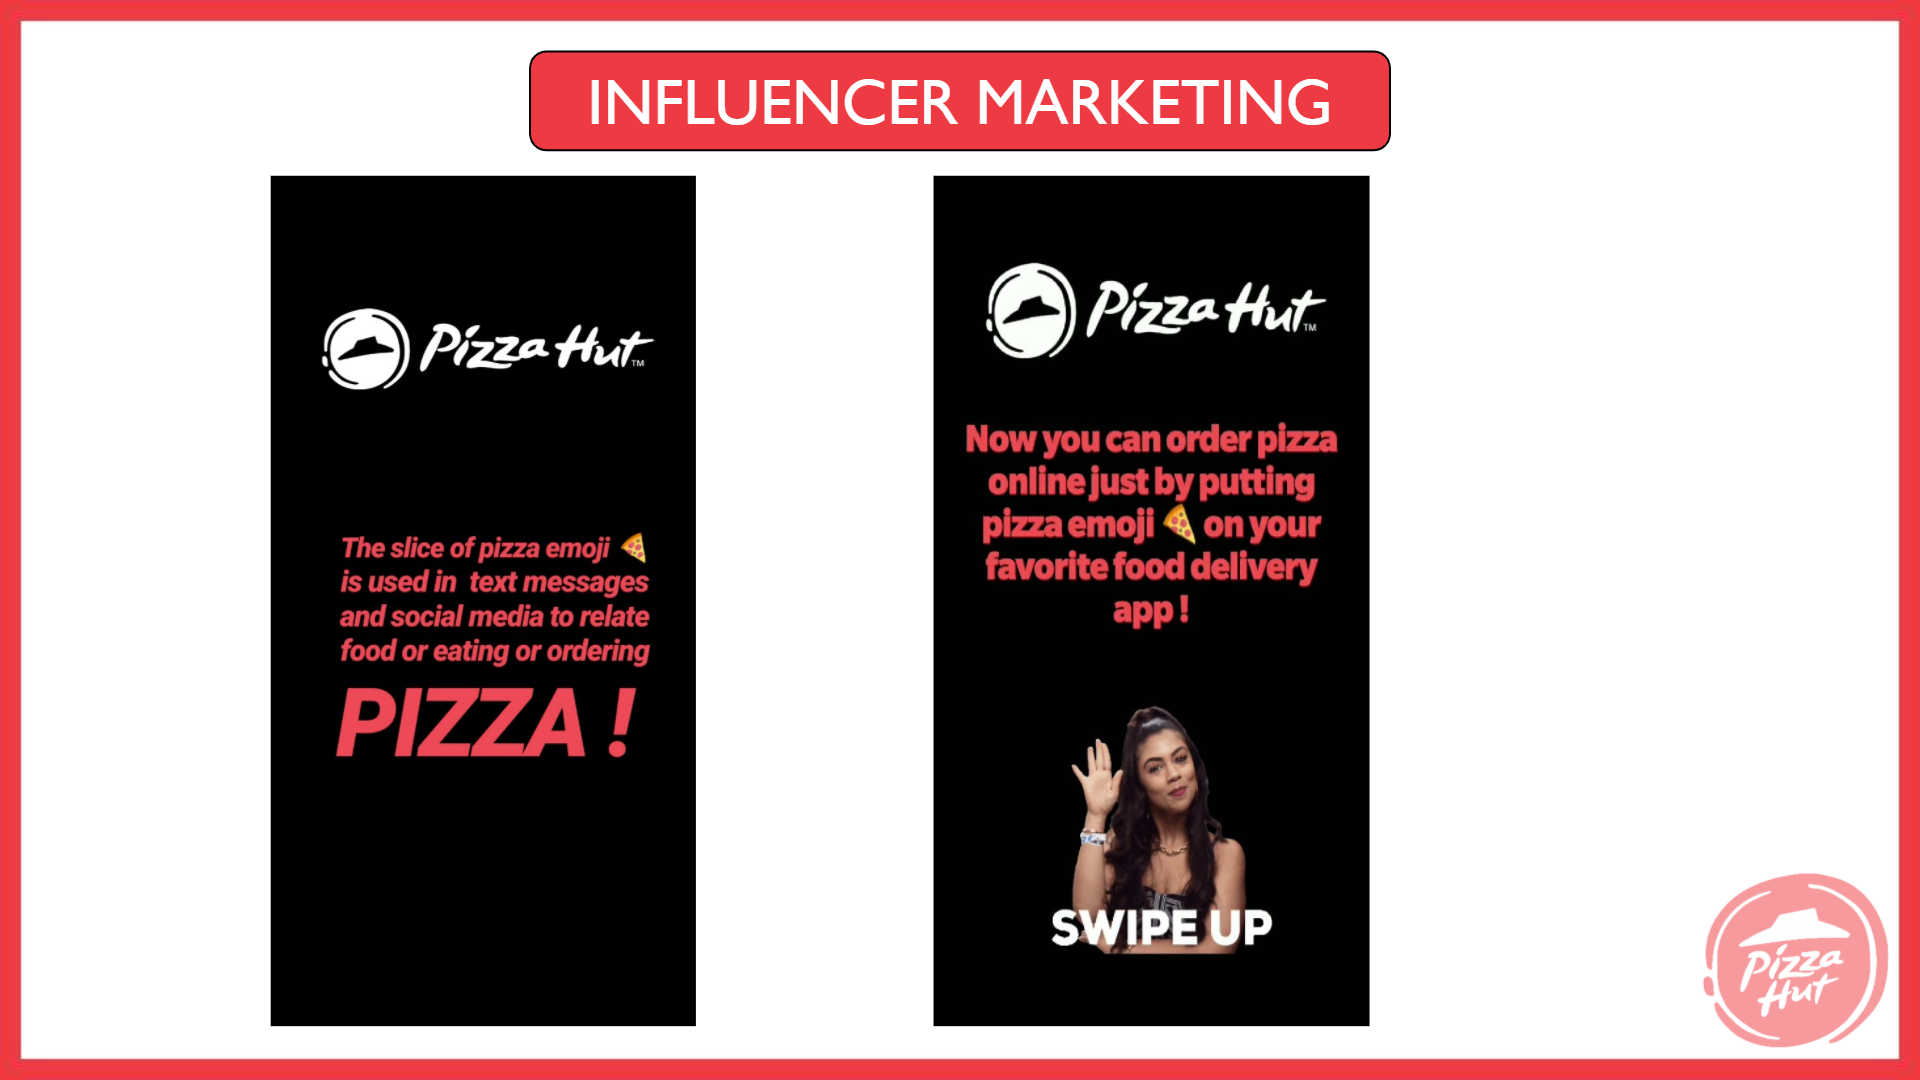 pizza hut marketing strategy Inluencer Marketing 3 - Pizza Hut Marketing and Advertising Strategy